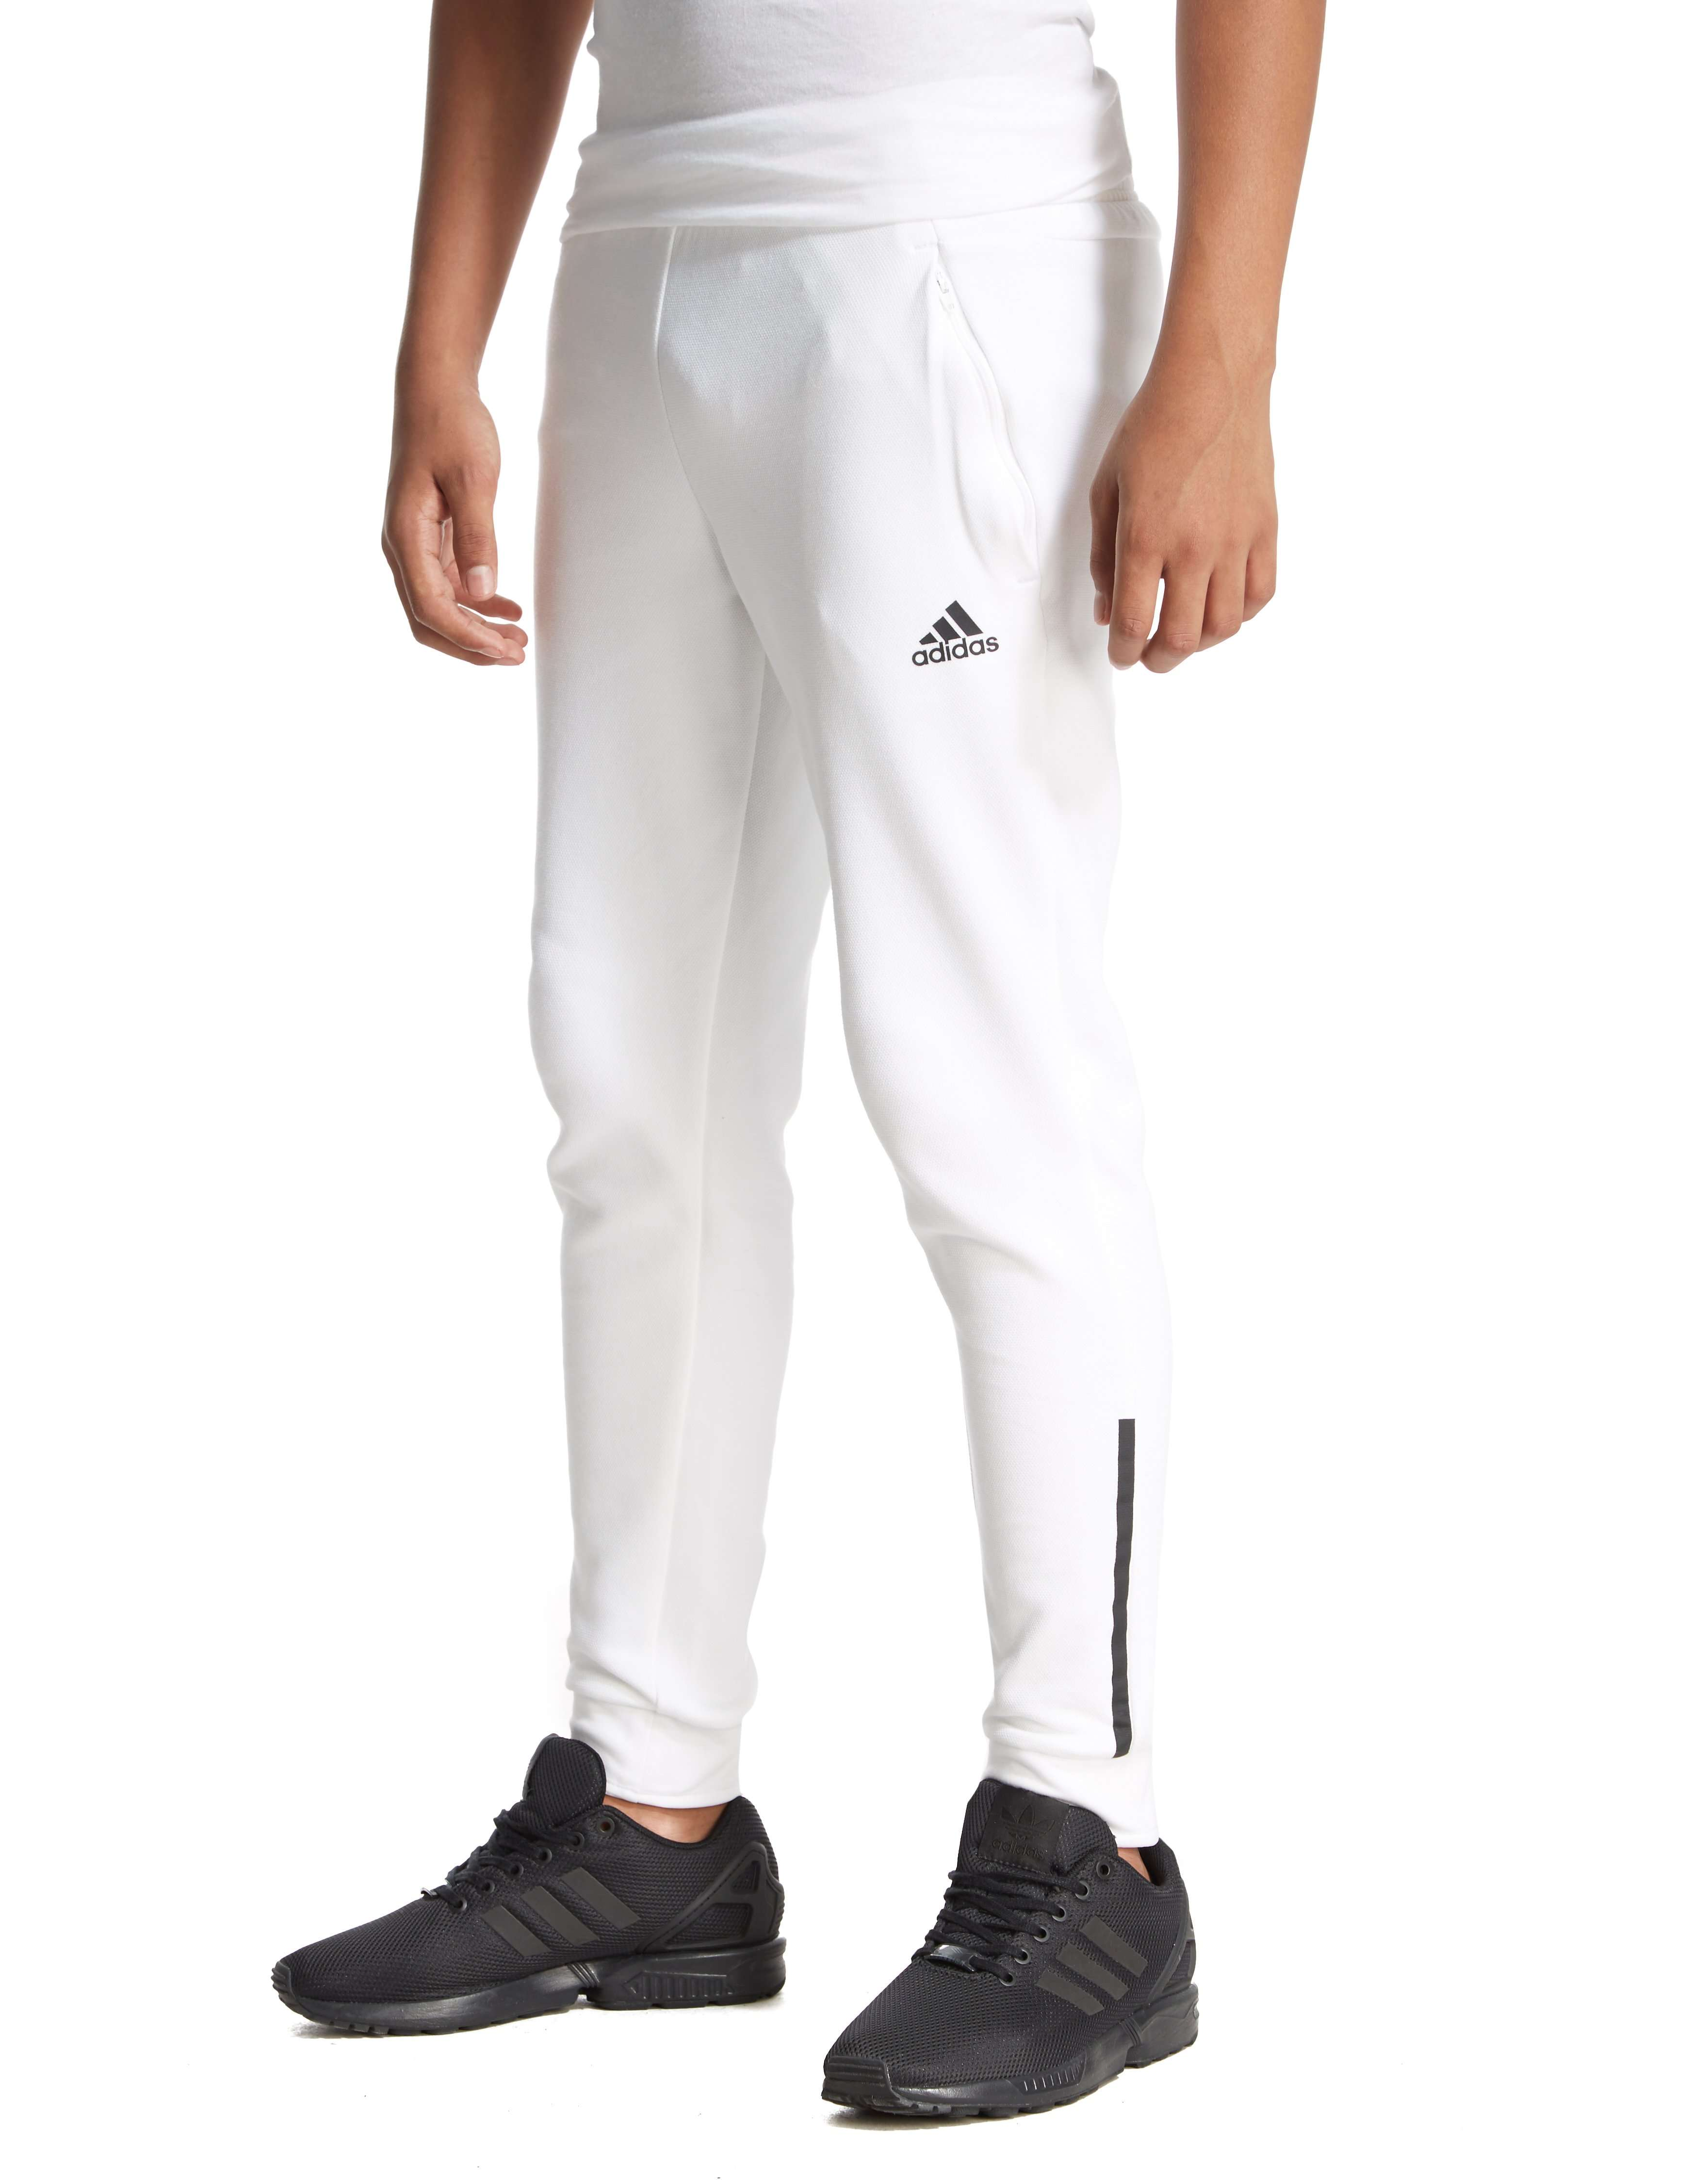 adidas Z.N.E Pants Junior